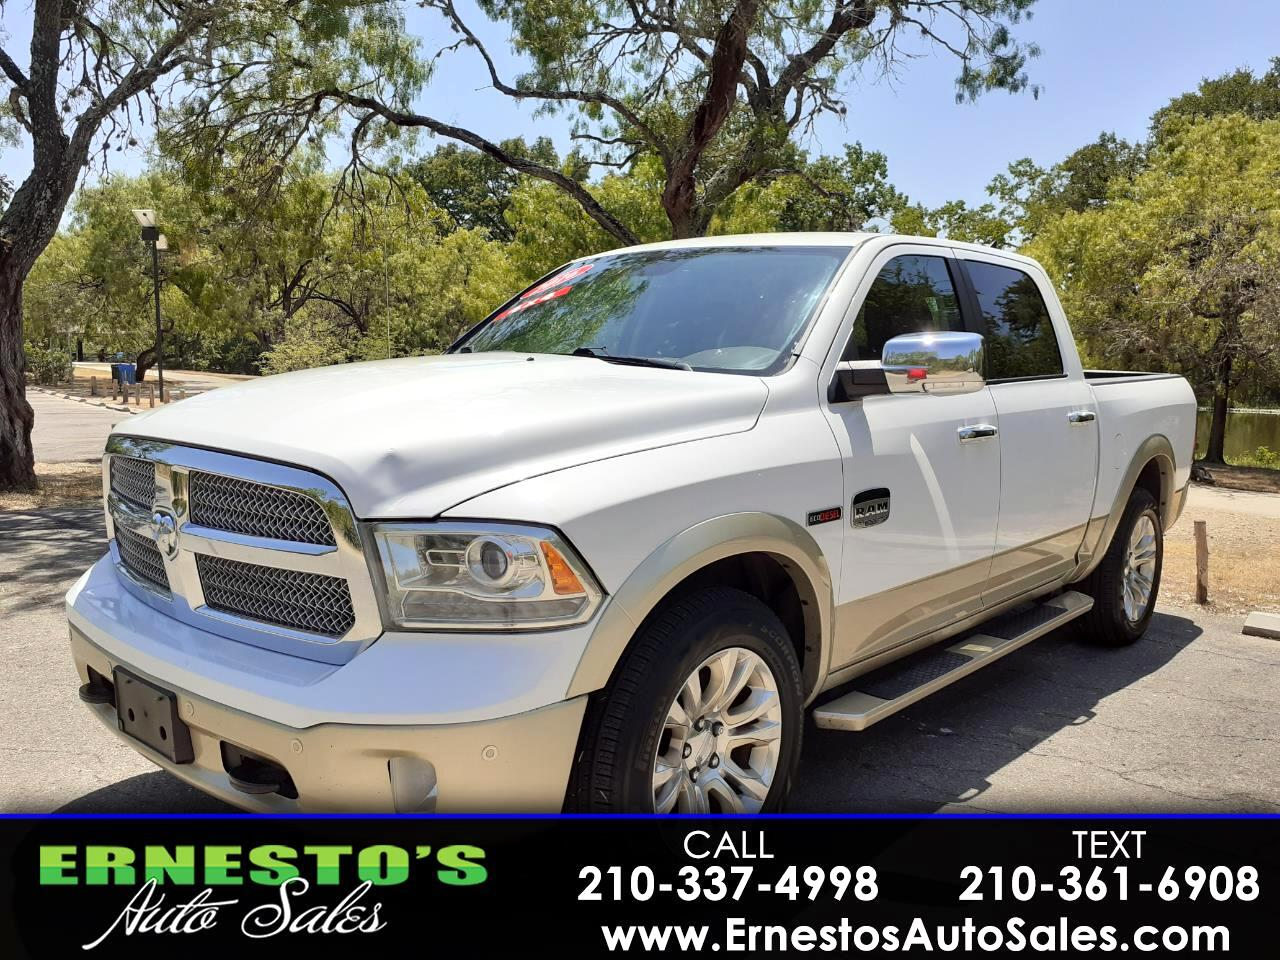 Used Cars San Antonio Tx Used Cars Trucks Tx Ernesto S